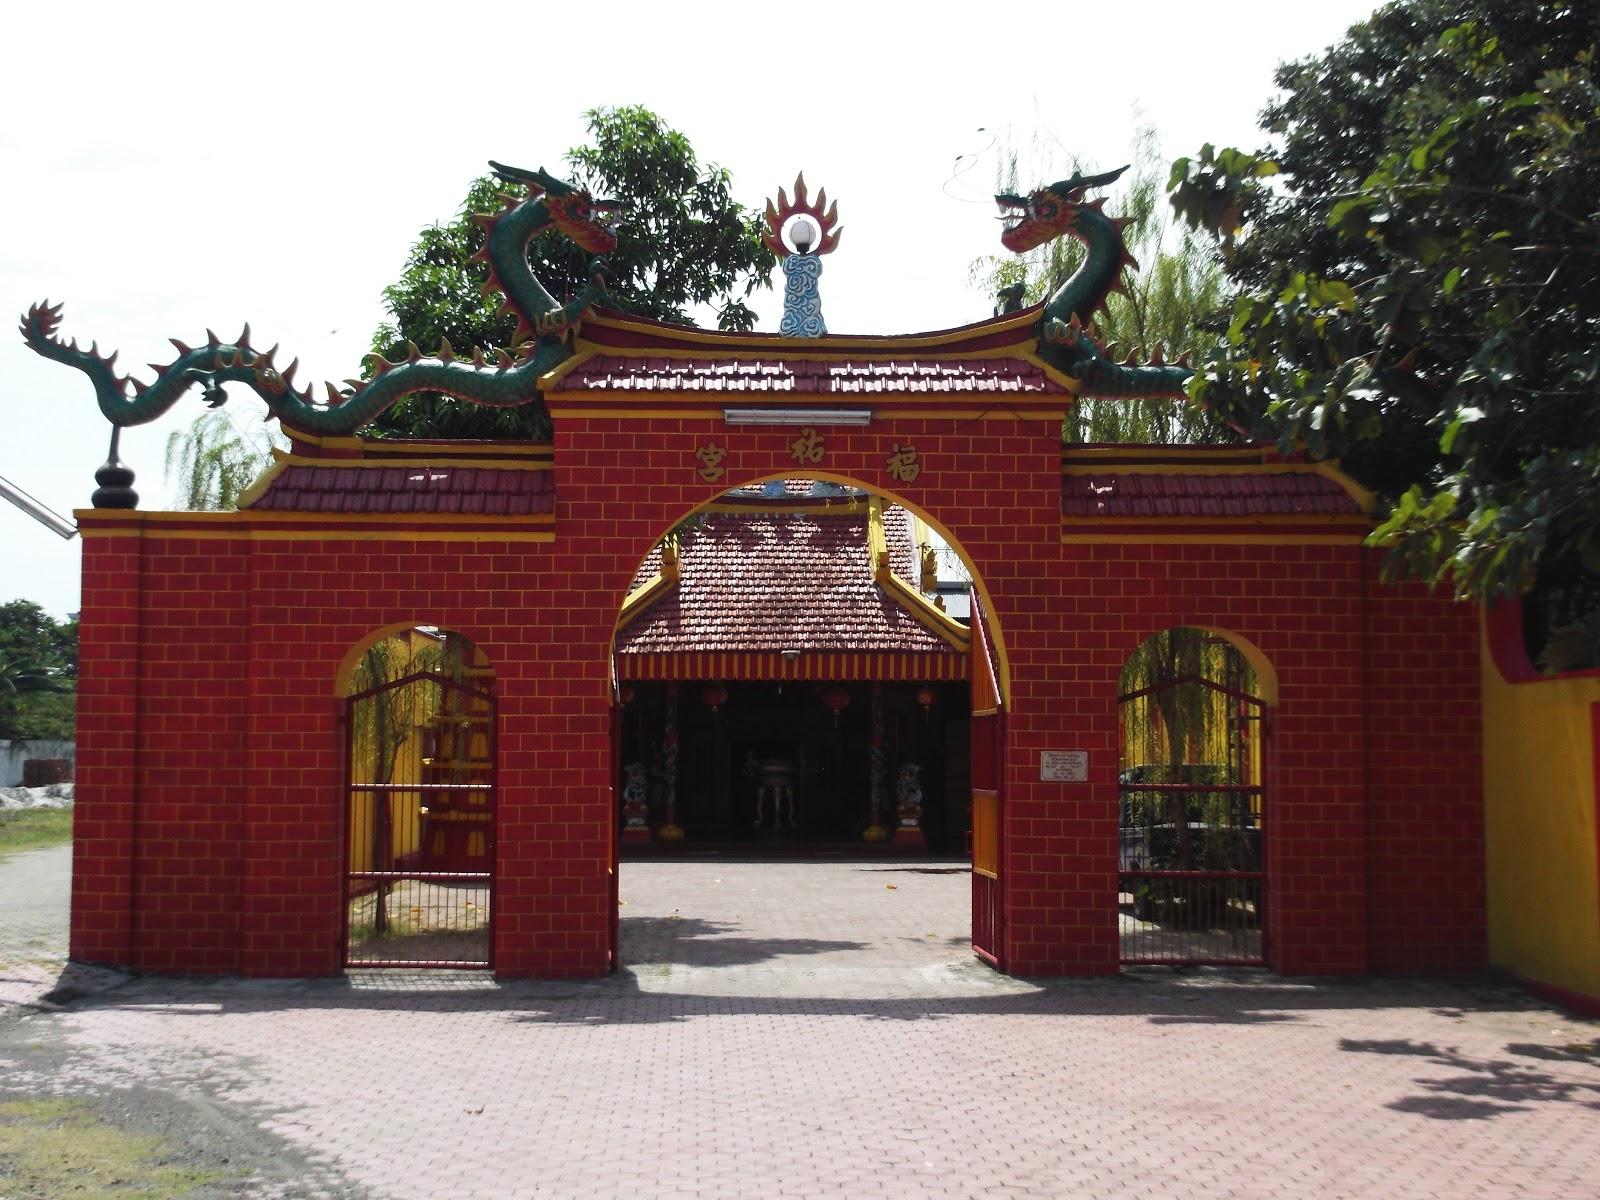 Klenteng Hok Yoe Kiong Sukomoro Kekunaan Soen Boen Lee Membangun